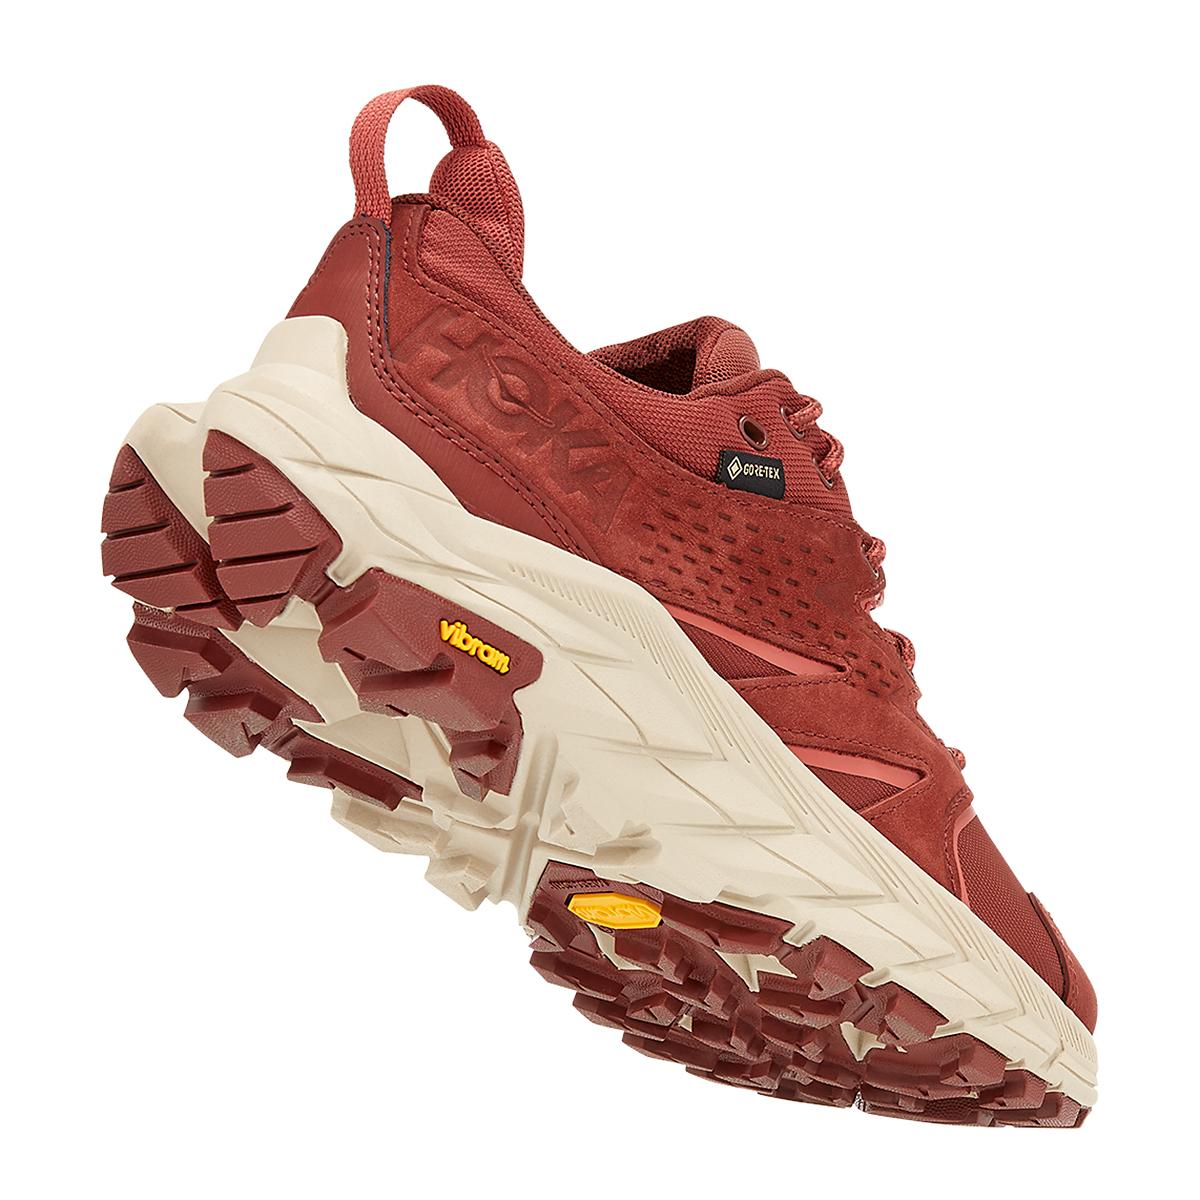 Women's Hoka One One Anacapa Low Gore-Tex Trail Running Shoe - Color: Cherry Mahogany - Size: 5 - Width: Regular, Cherry Mahogany, large, image 3